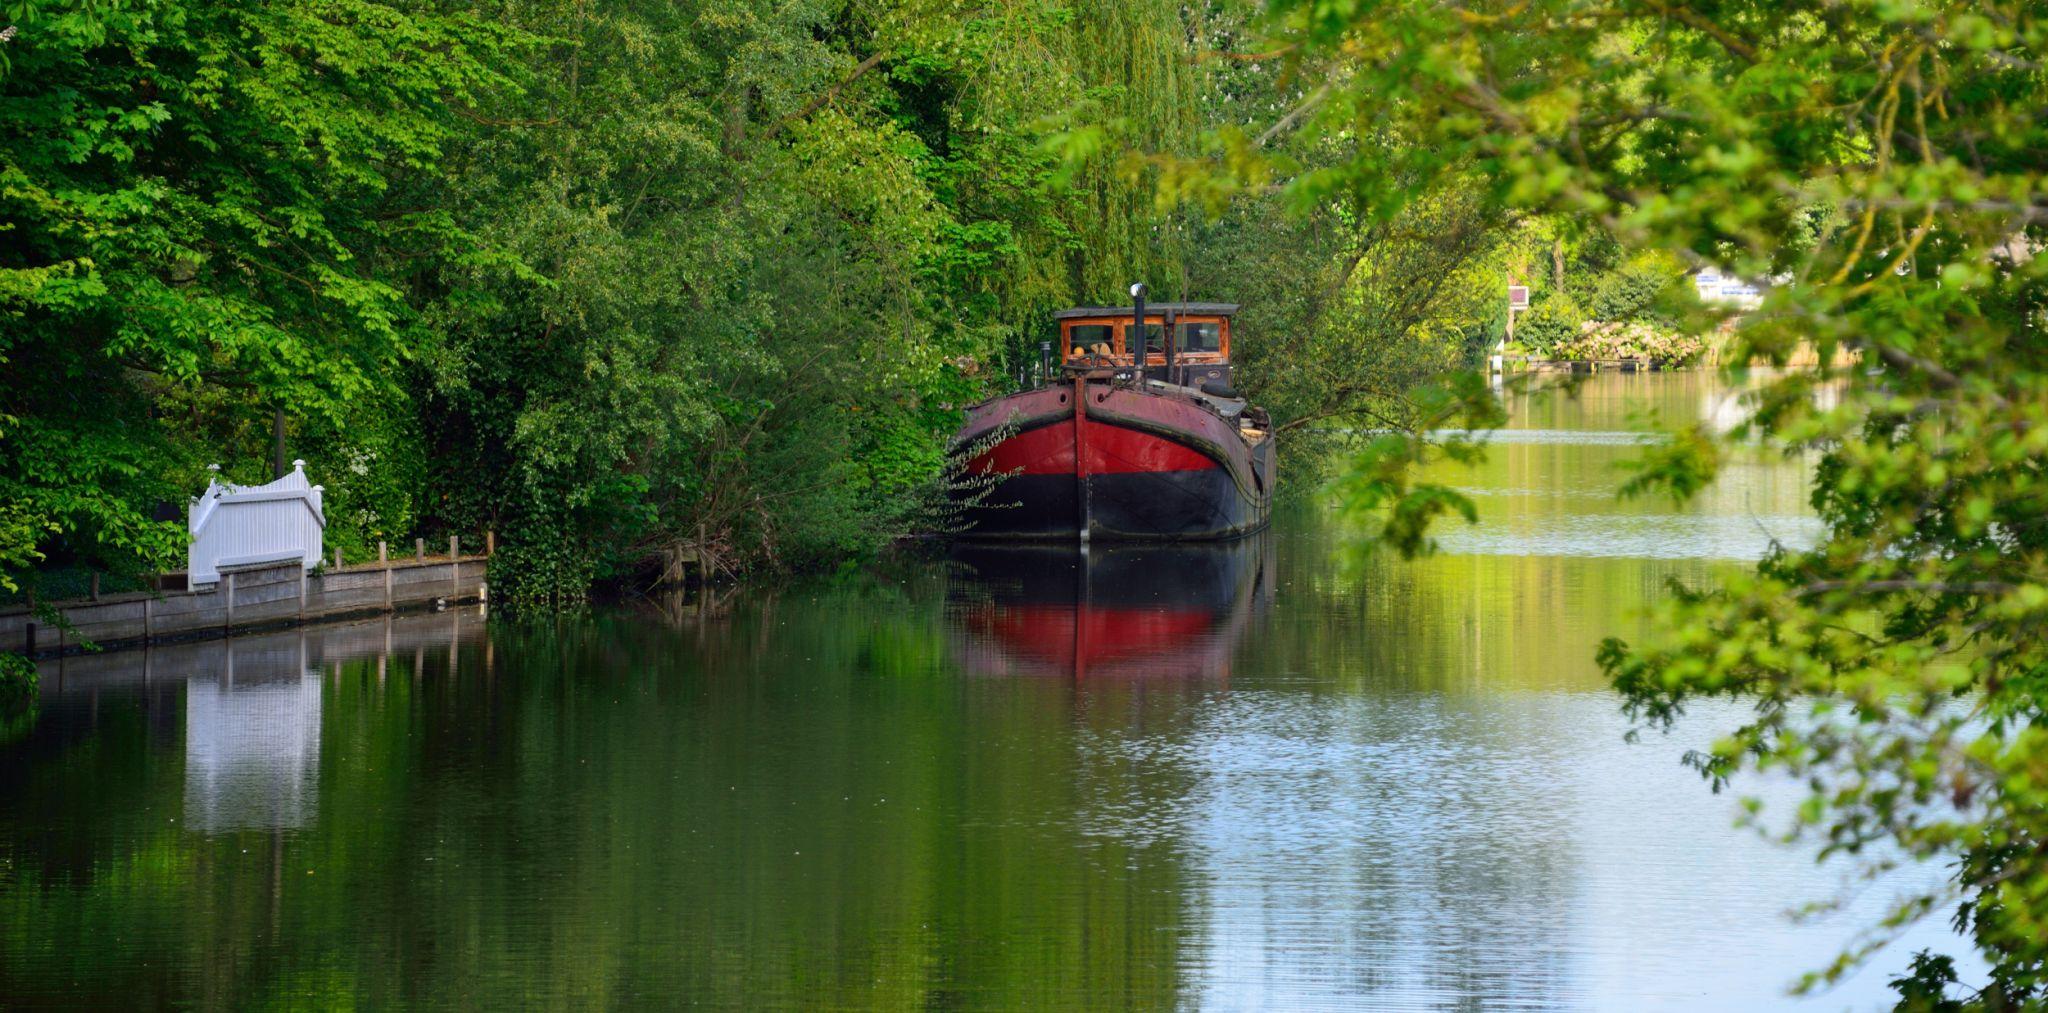 The red boat on the Vecht river, Breukelen, Netherlands